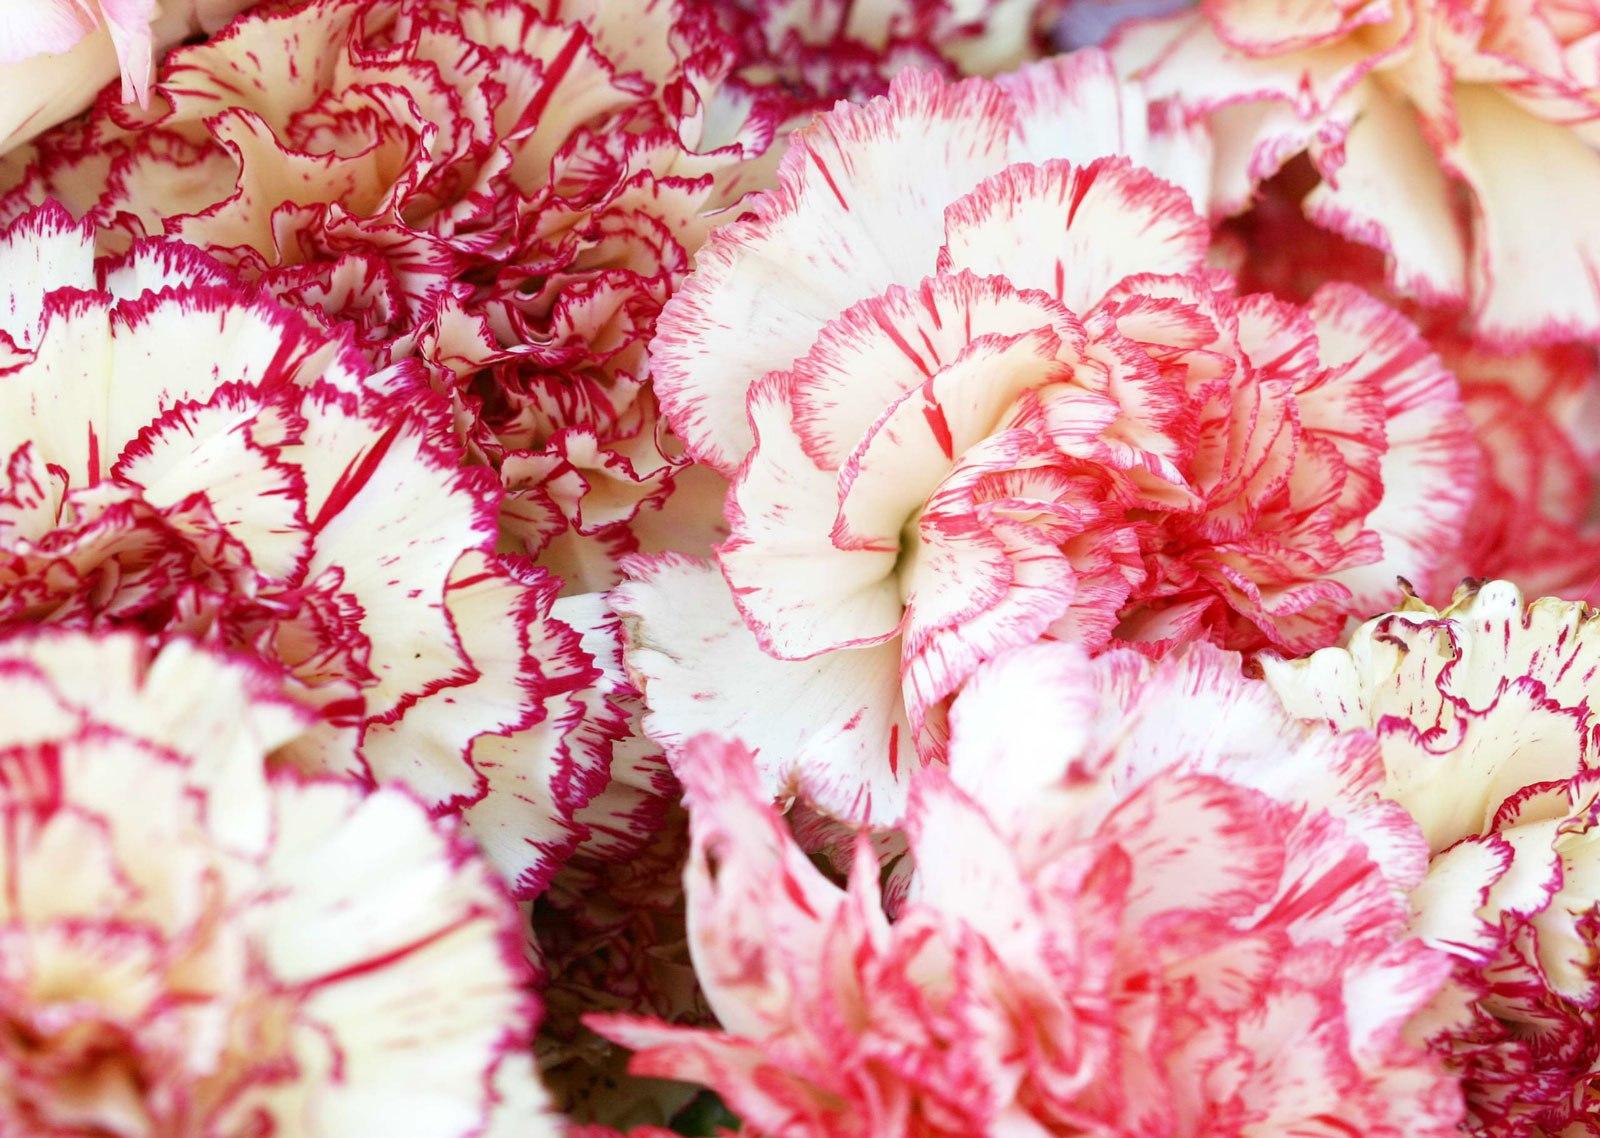 Цветы гвоздики шабо фото цветов